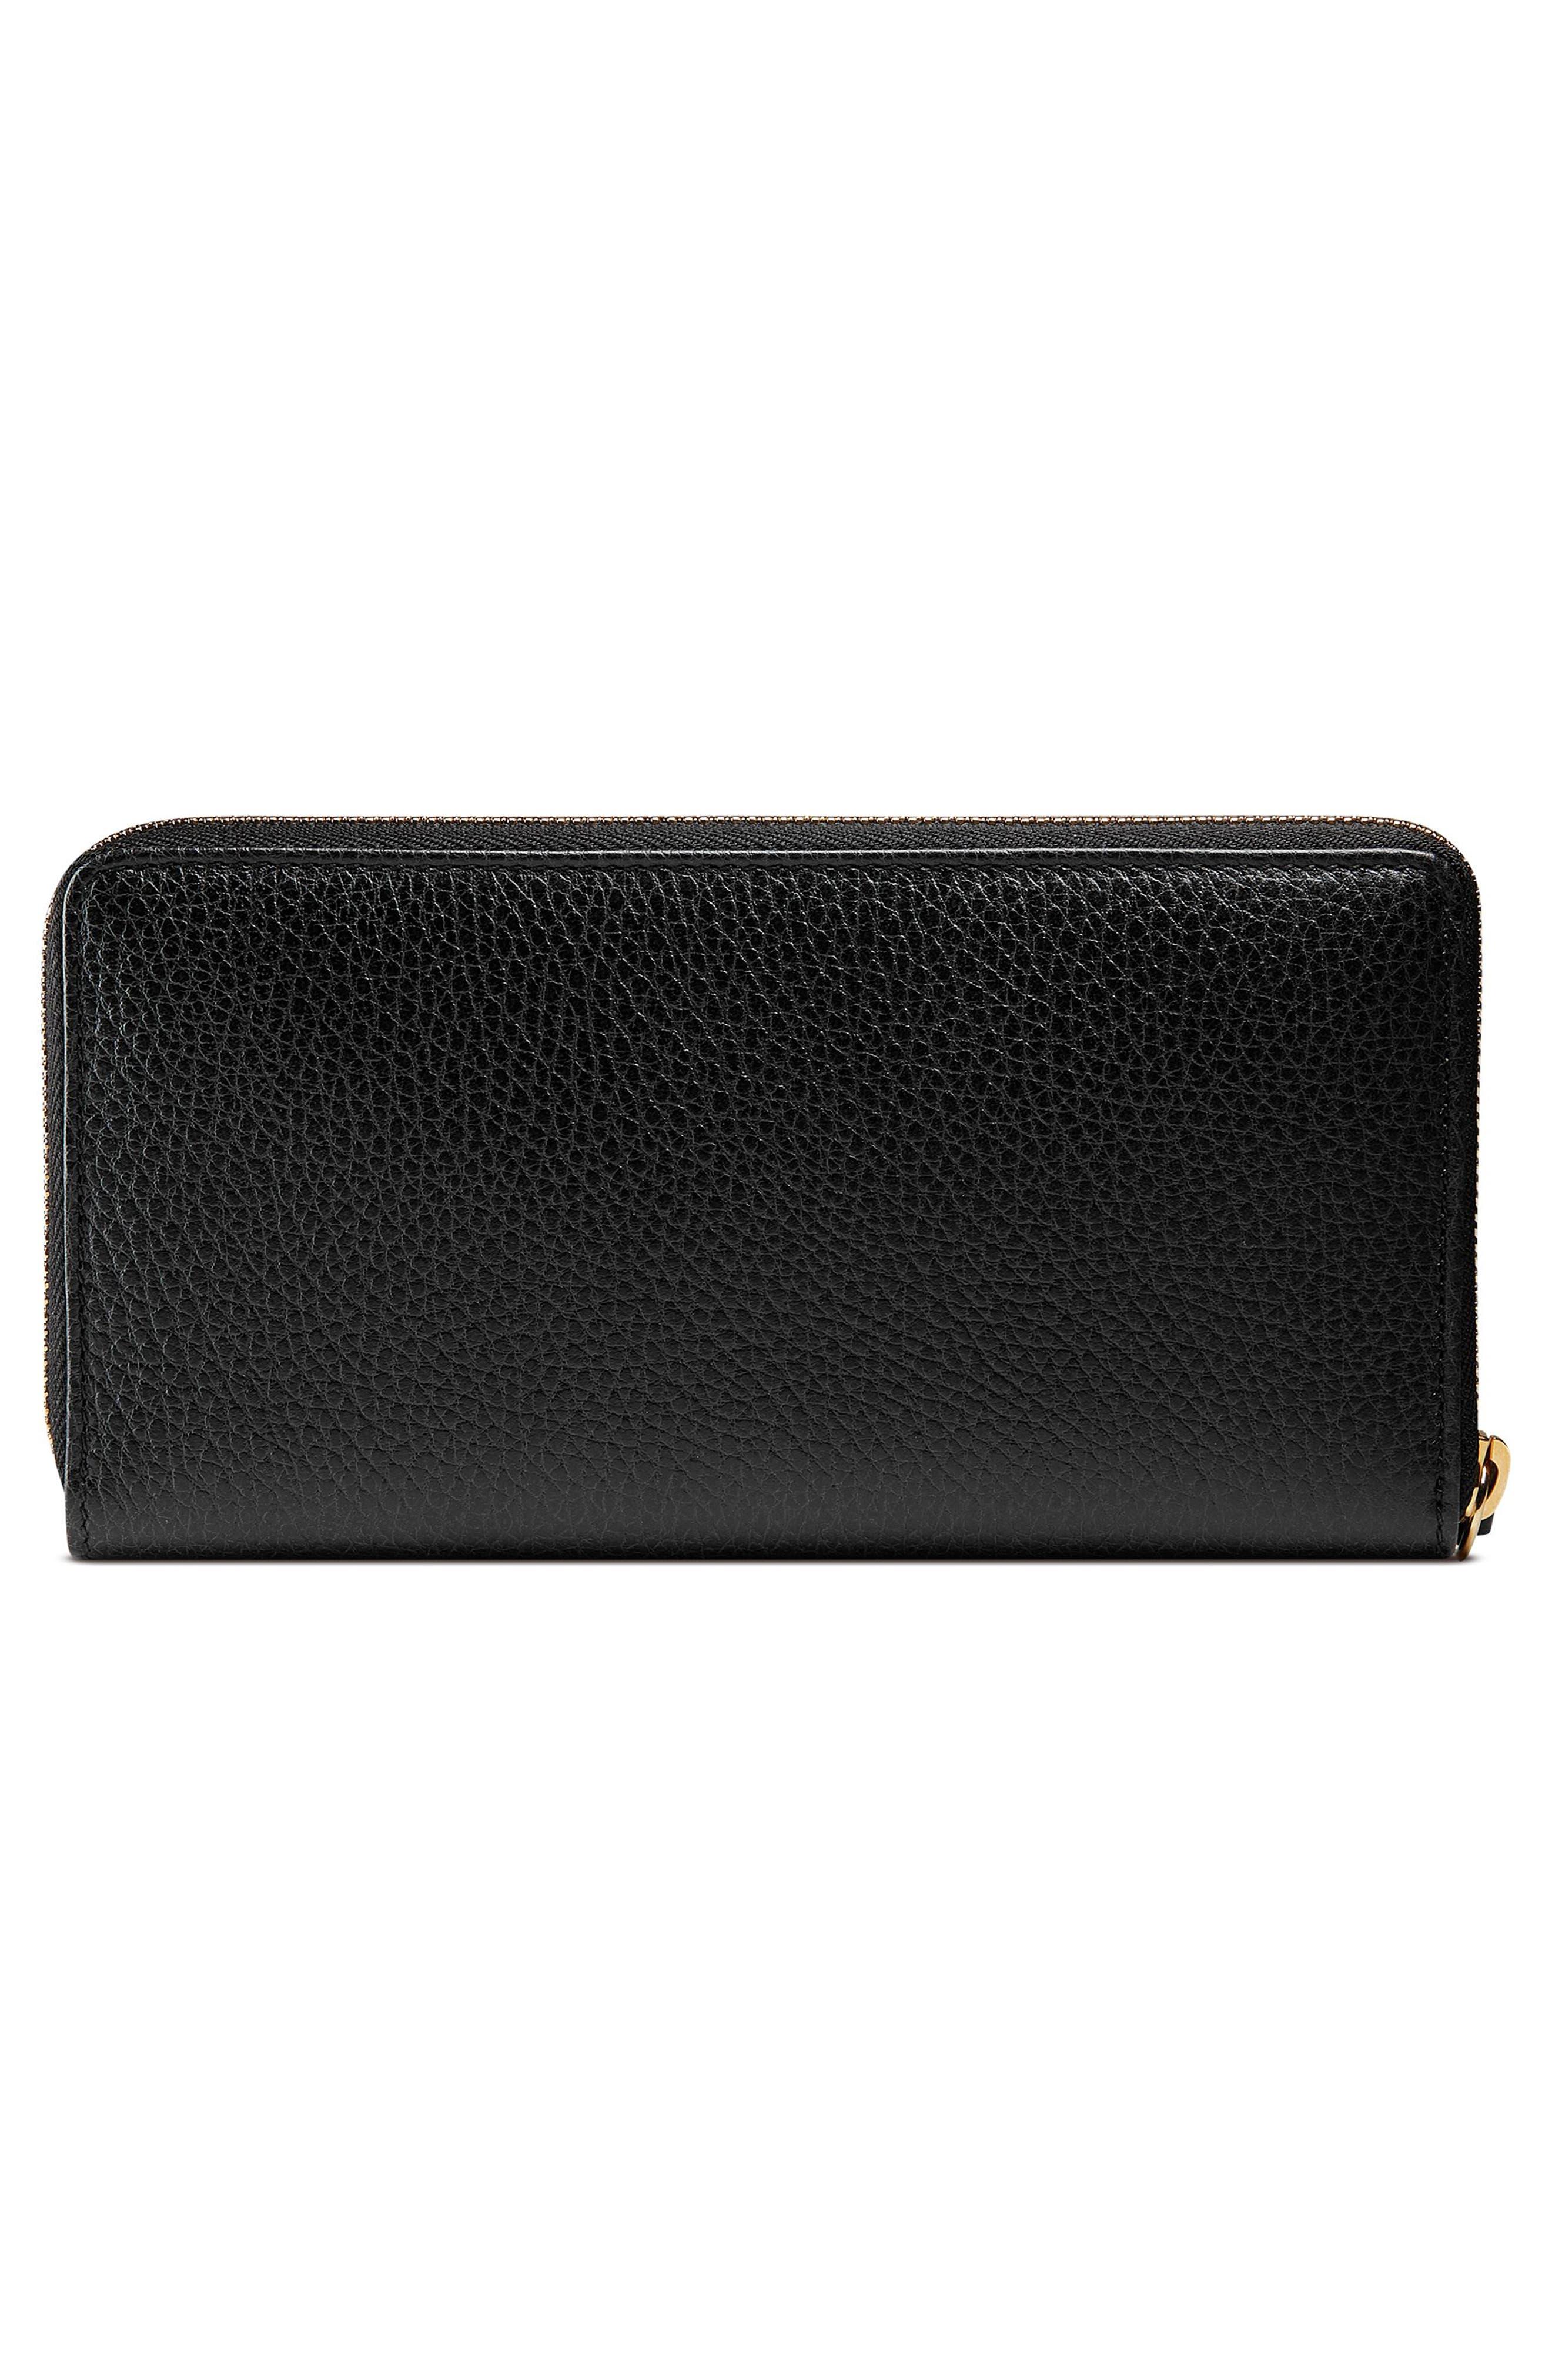 Petite Marmont Leather Zip Around Wallet,                             Alternate thumbnail 3, color,                             Nero/ Nero